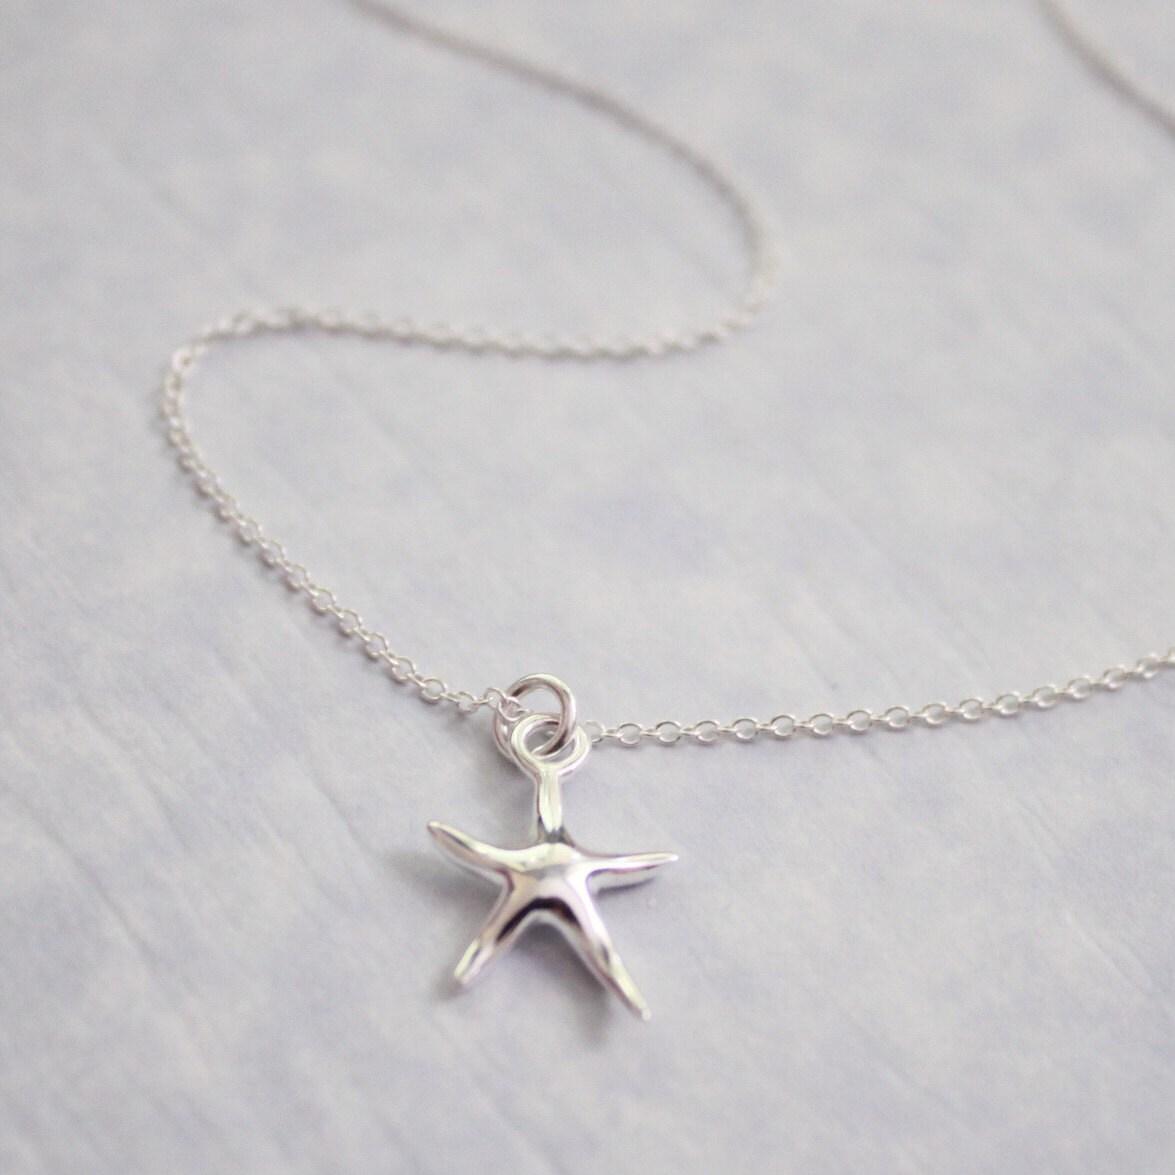 sterling silver starfish necklace bridesmaid gift bridesmaid